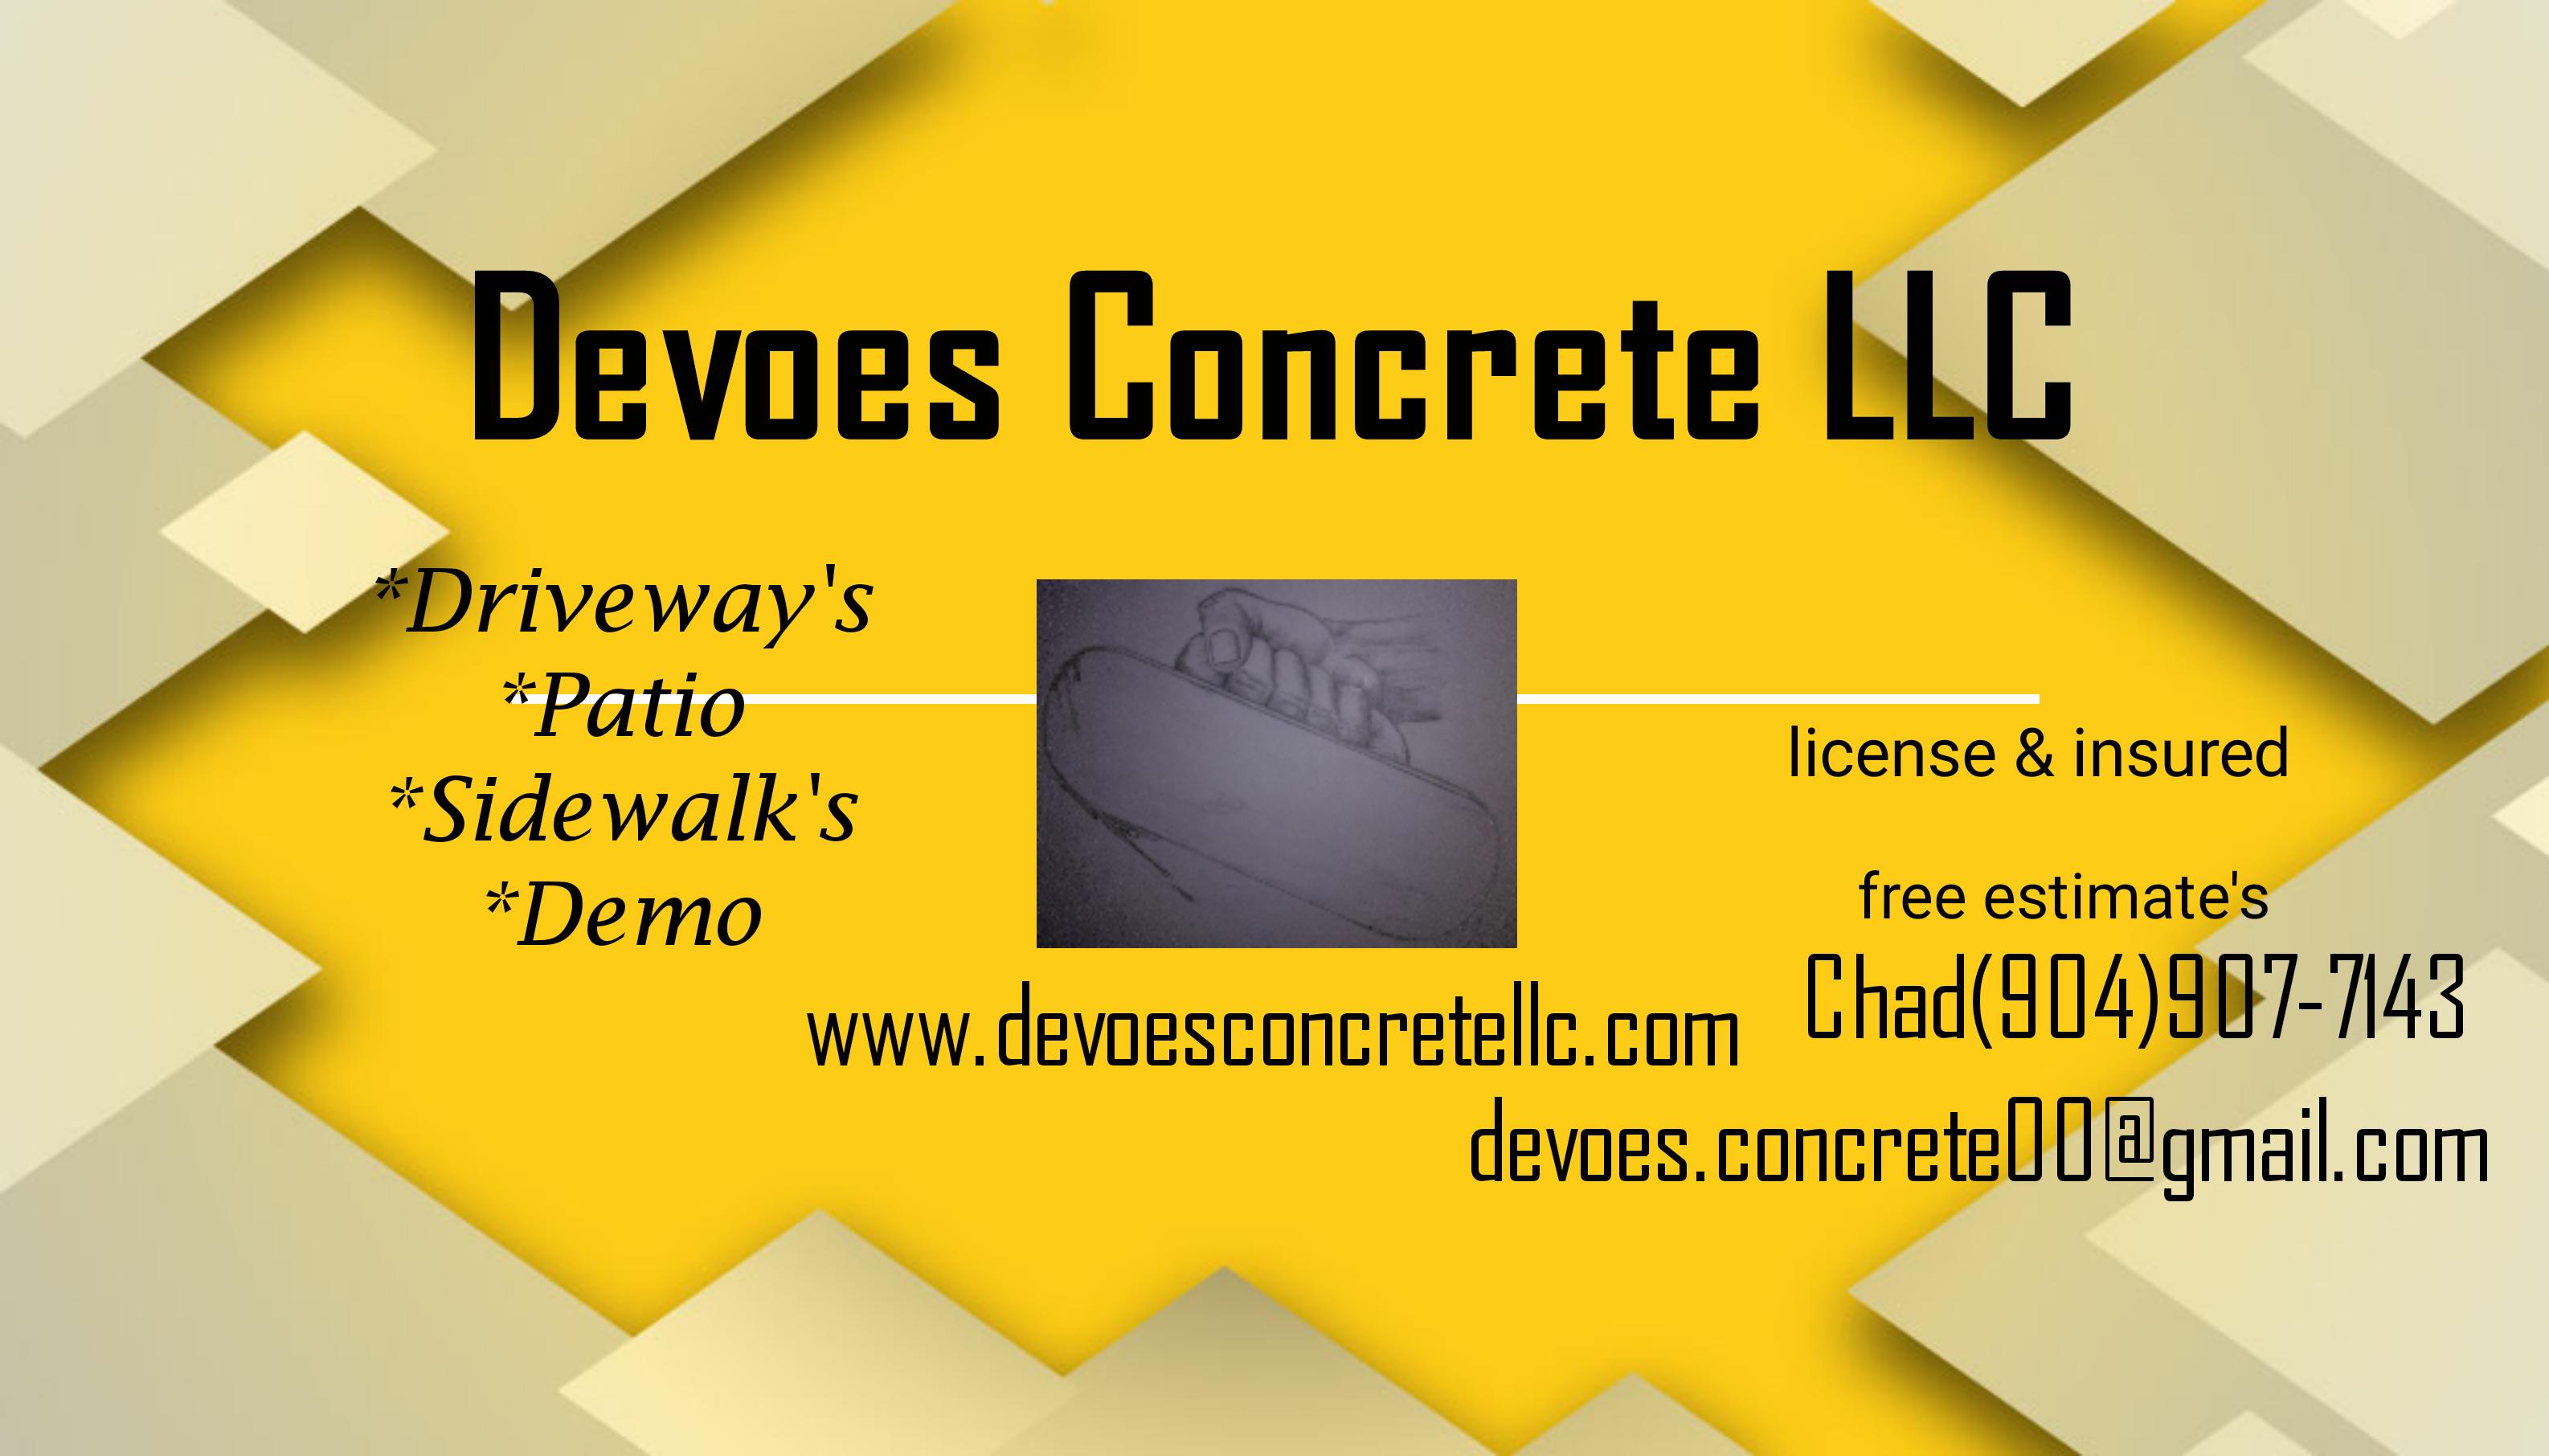 Devoes Concrete LLC